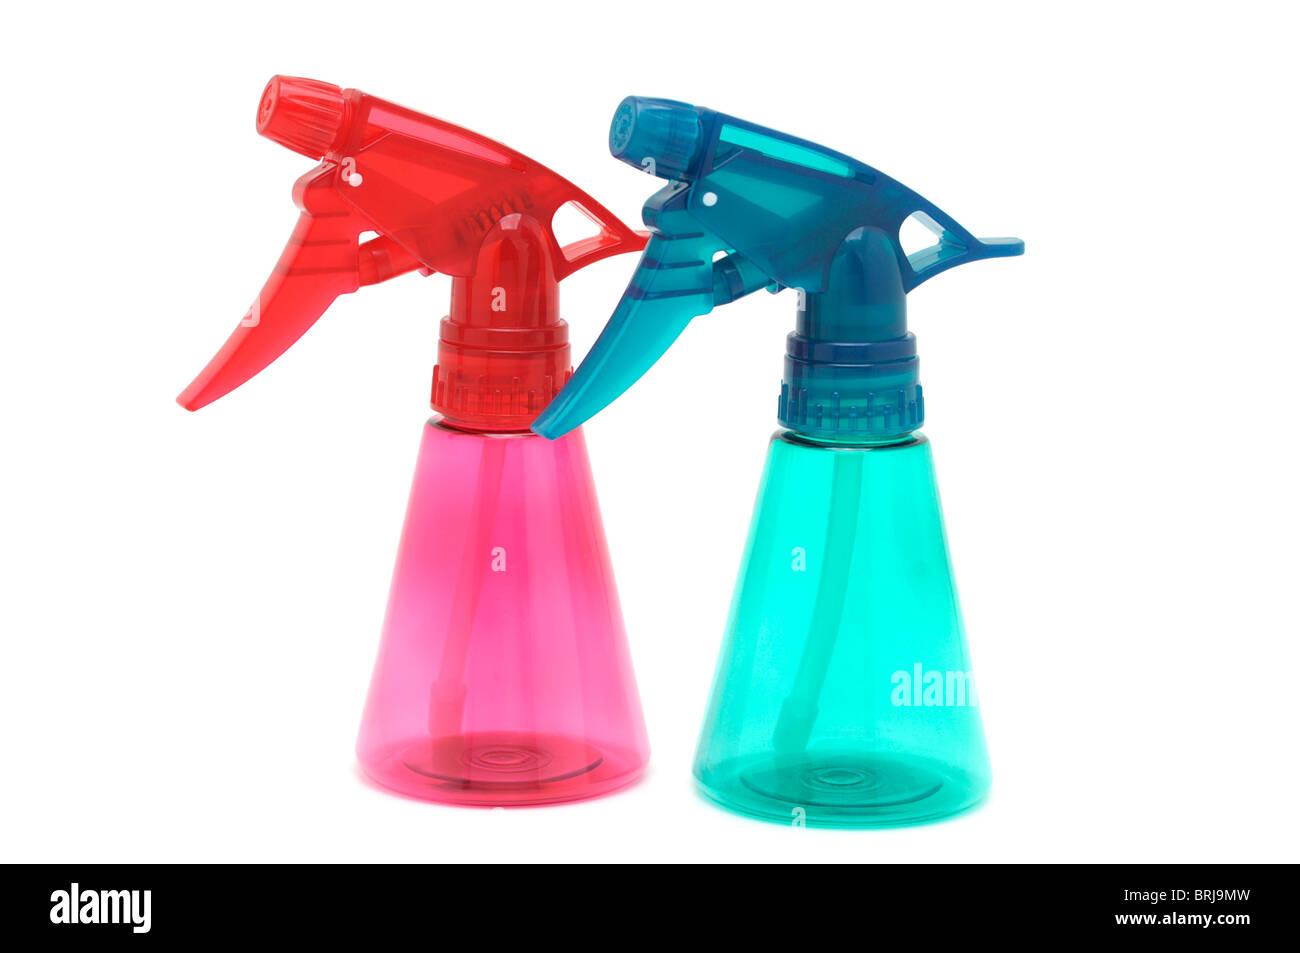 Empty Spray Bottles - Stock Image